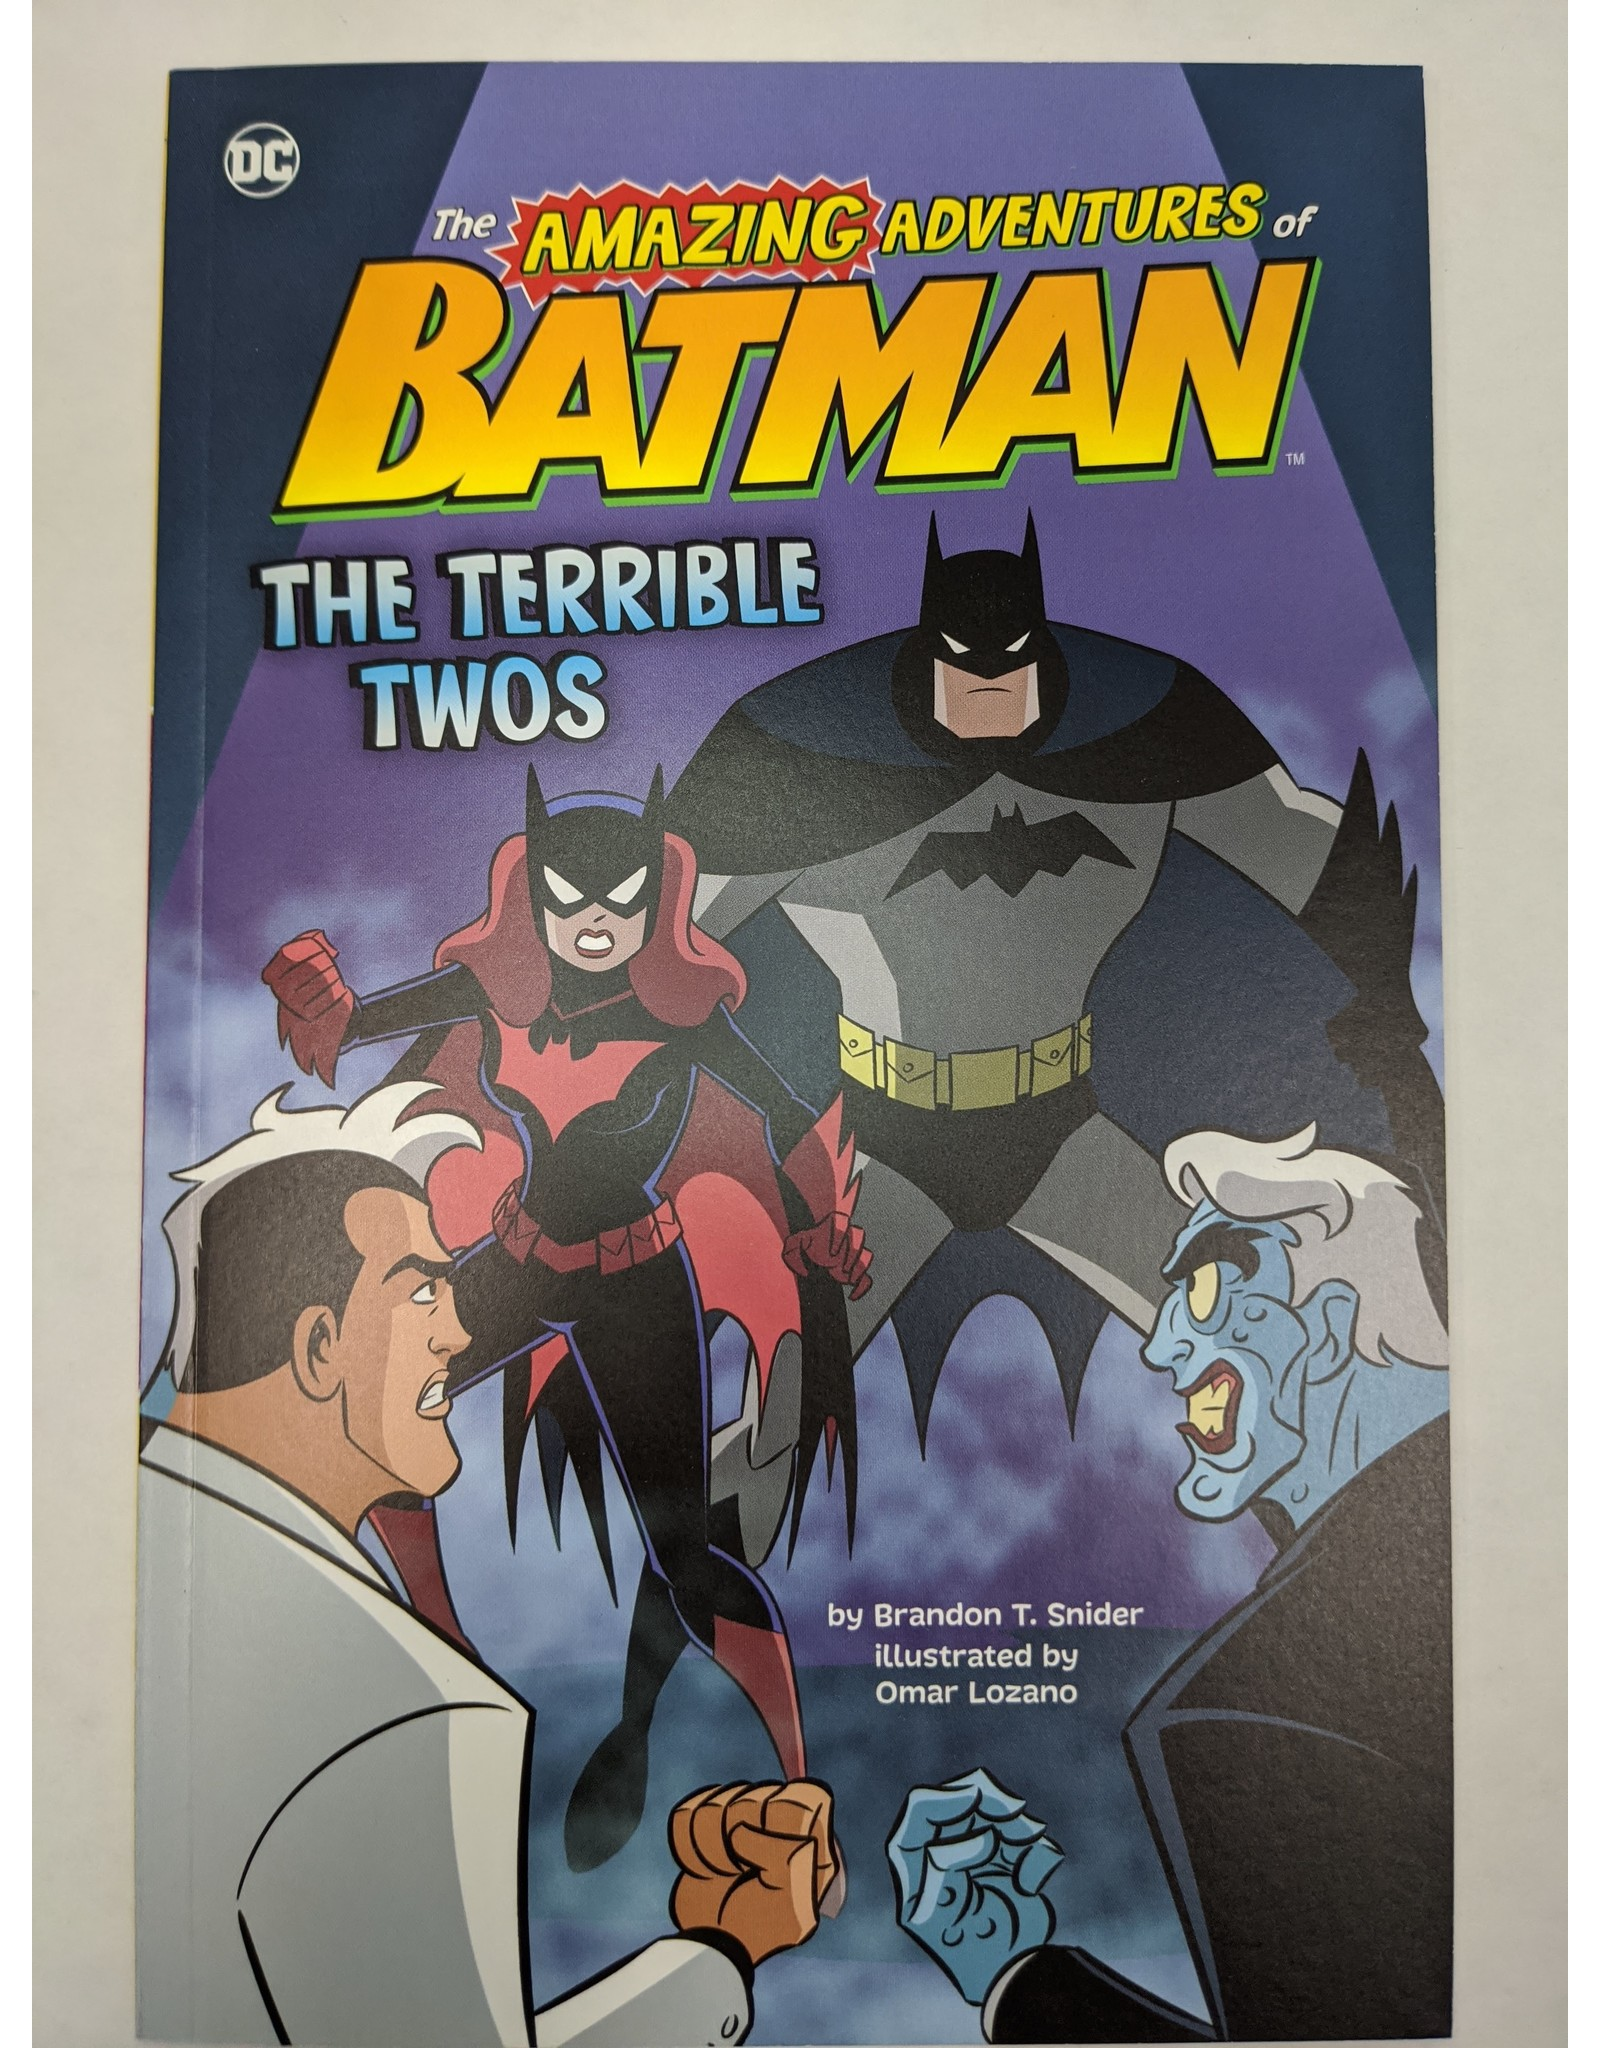 STONE ARCH BOOKS DC AMAZING ADV OF BATMAN YR SC TERRIBLE TWOS